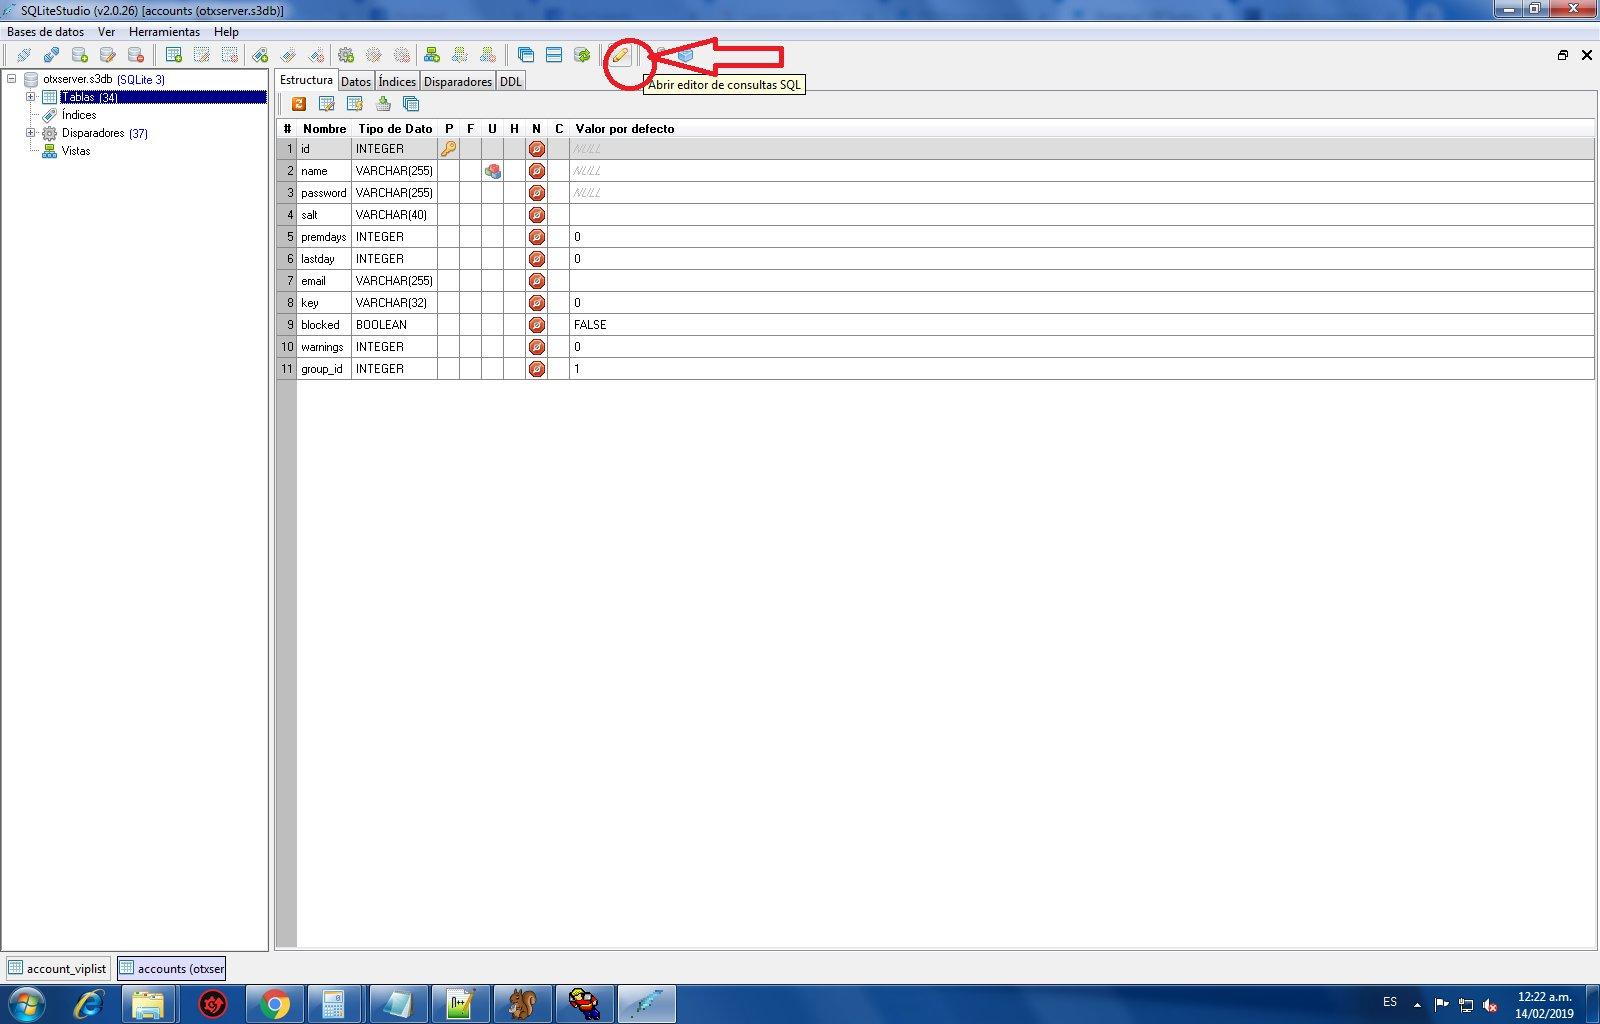 [Sistema] VIP System (Mock tfs 0.3.7/0.4.0 / Otx) NCFzEOm